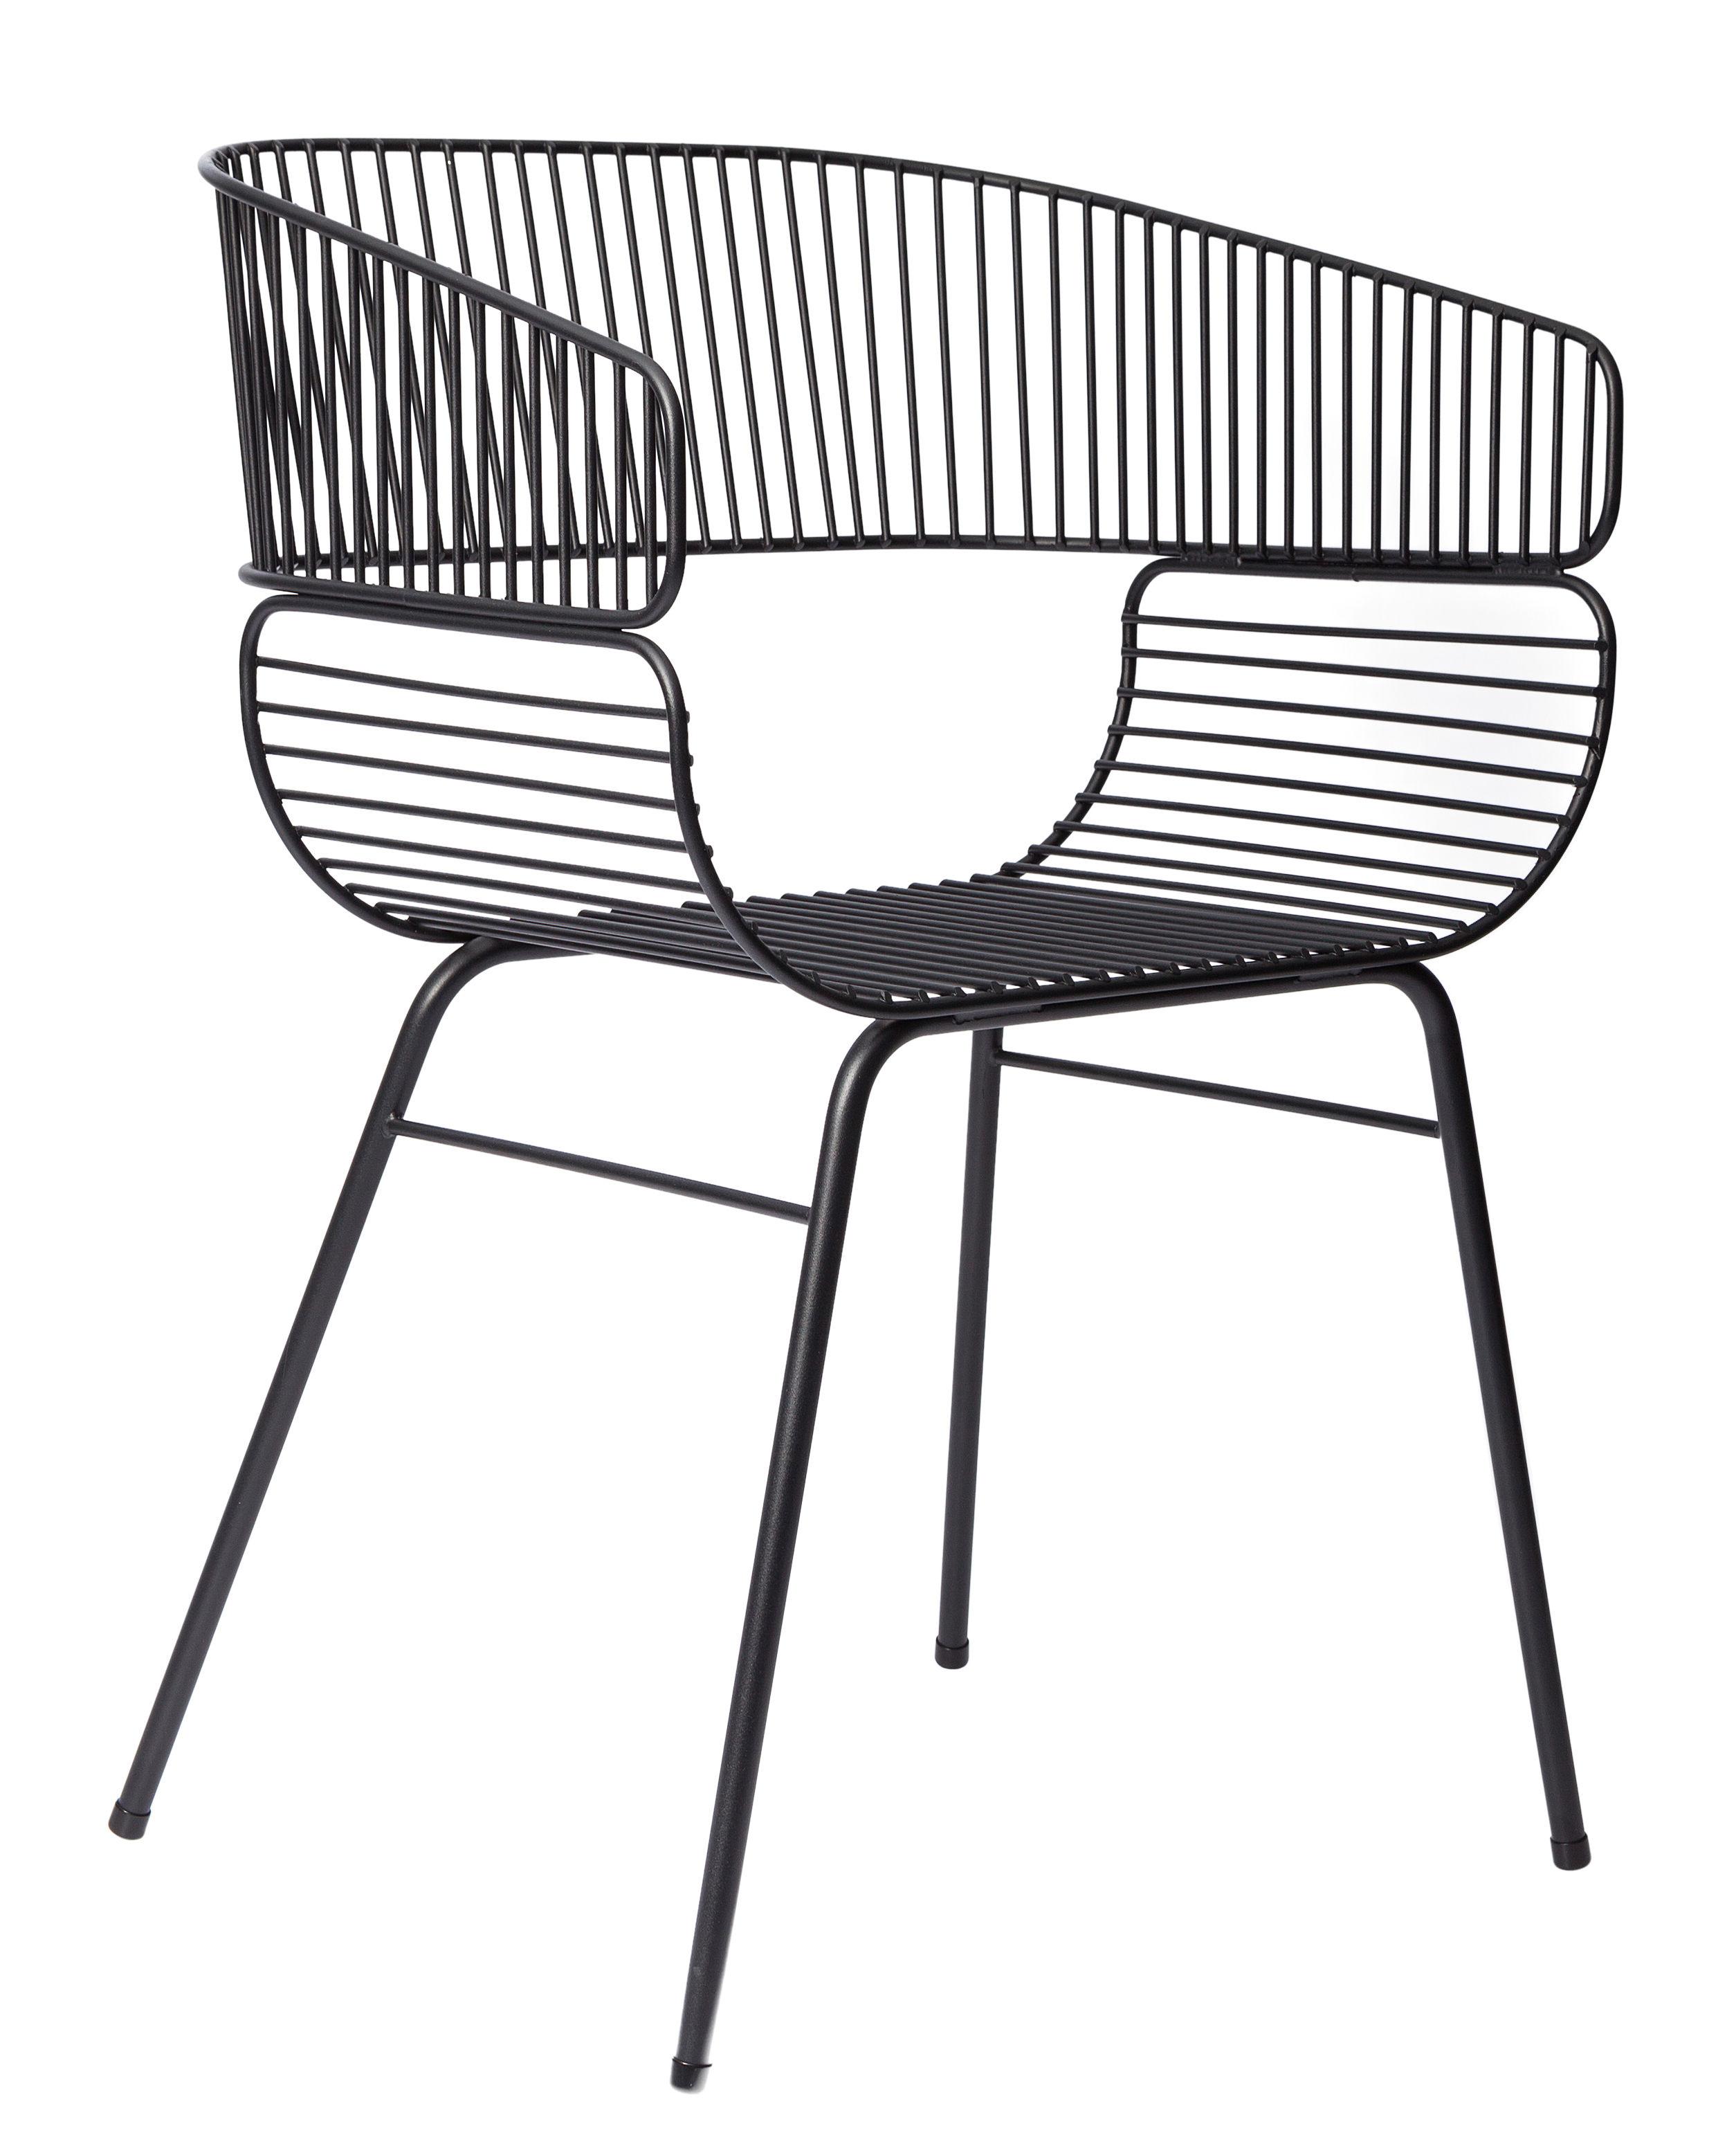 Möbel - Stühle  - Trame Sessel / Metall - Petite Friture - Schwarz - thermolackierter Stahl